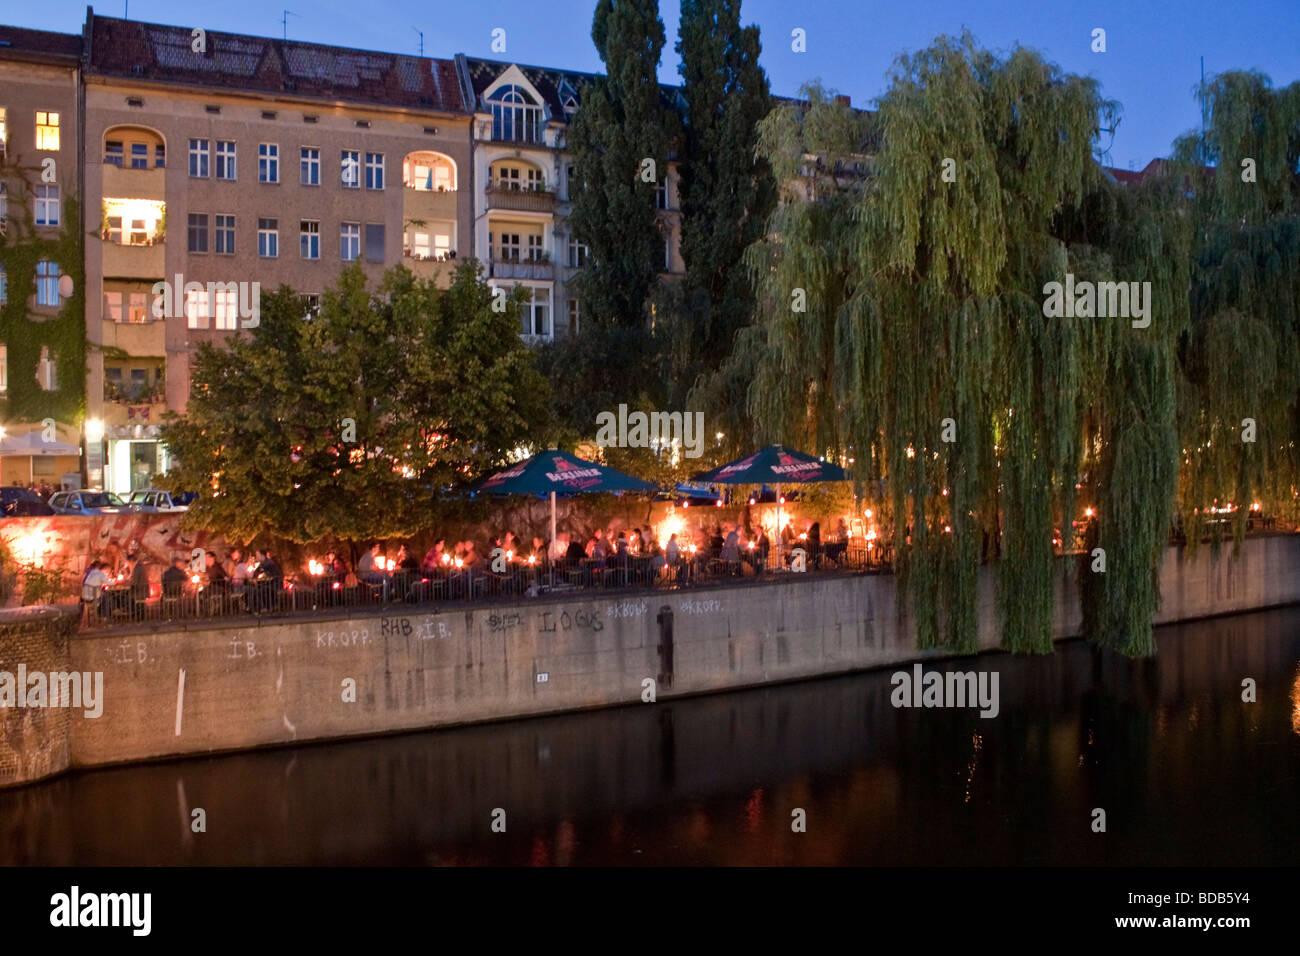 Cafe Uebersee bei Paul Lincke Ufer am Abend Landwehrkanal Kreuzberg Berlin Deutschland Stockbild